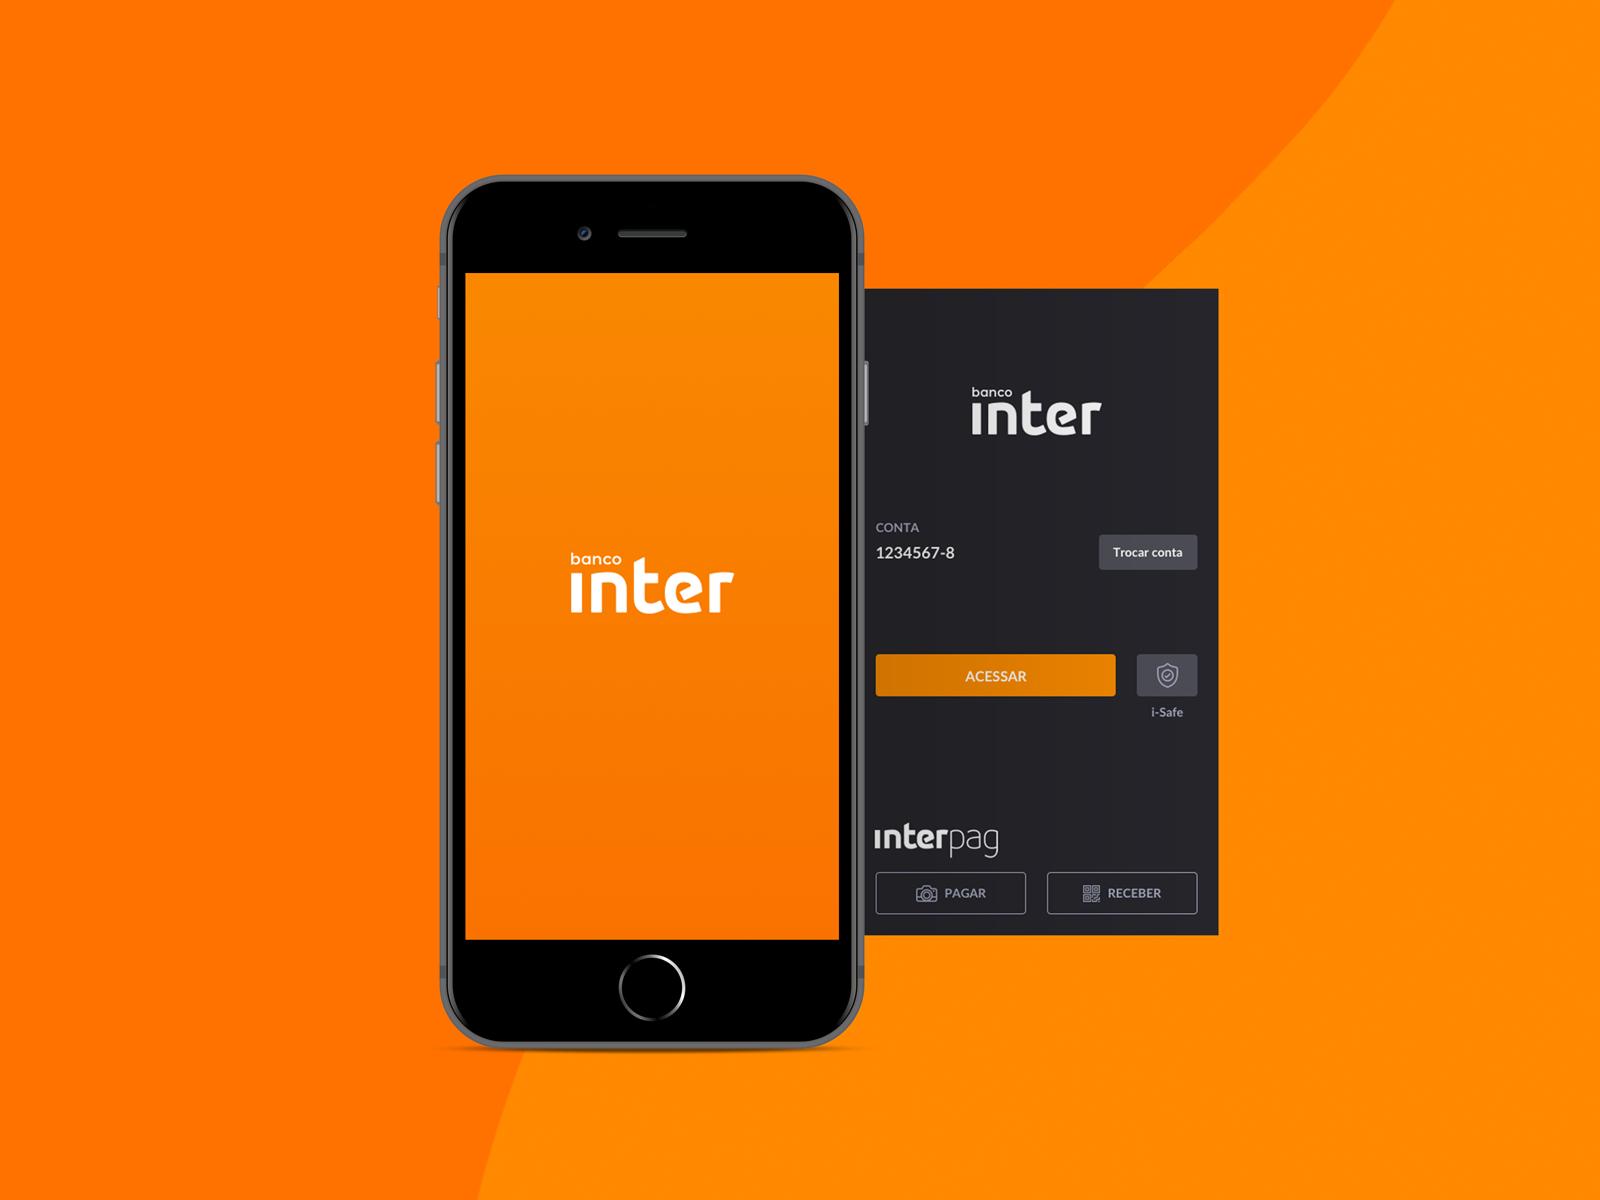 Banco inter app redesign